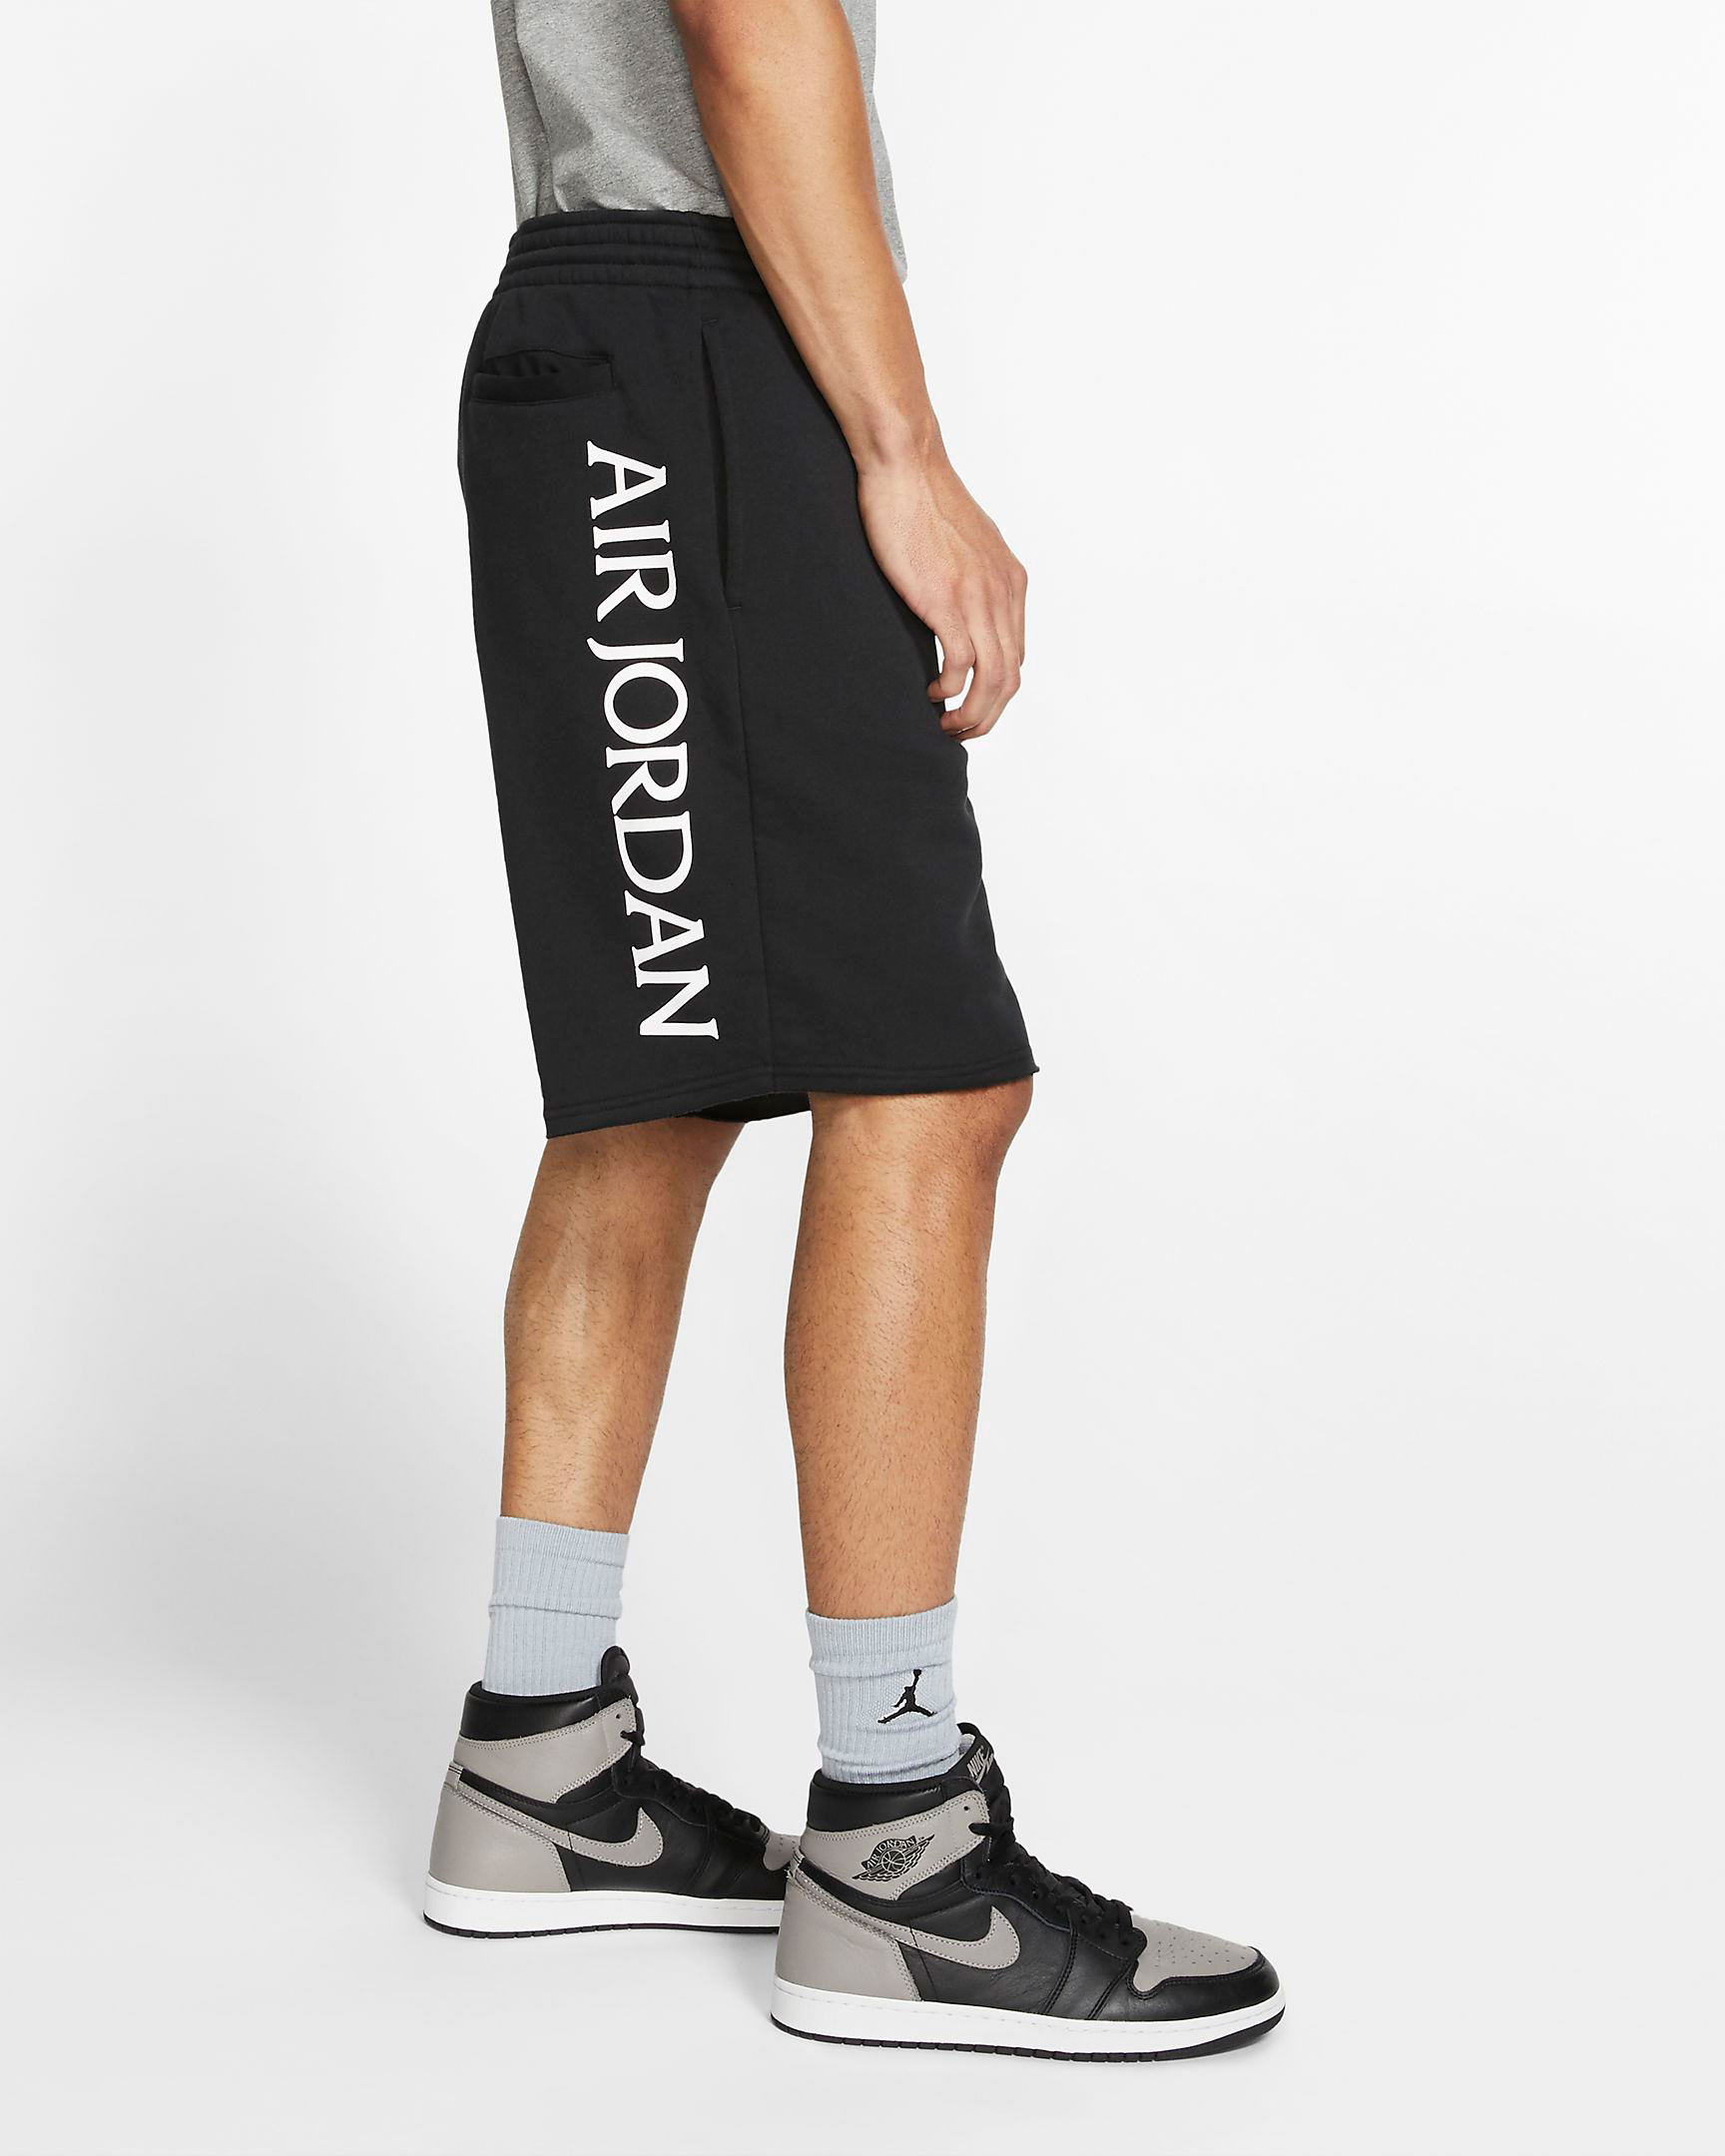 air-jordan-1-high-gym-red-black-shorts-3